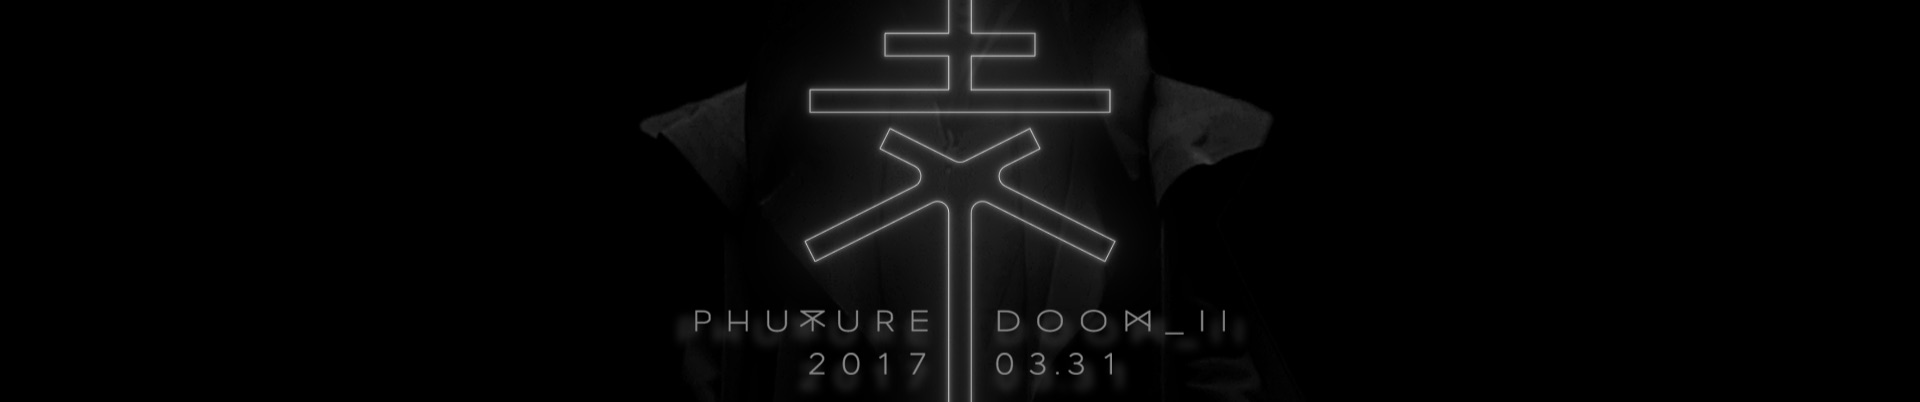 Phuture Doom Free Listening On Soundcloud